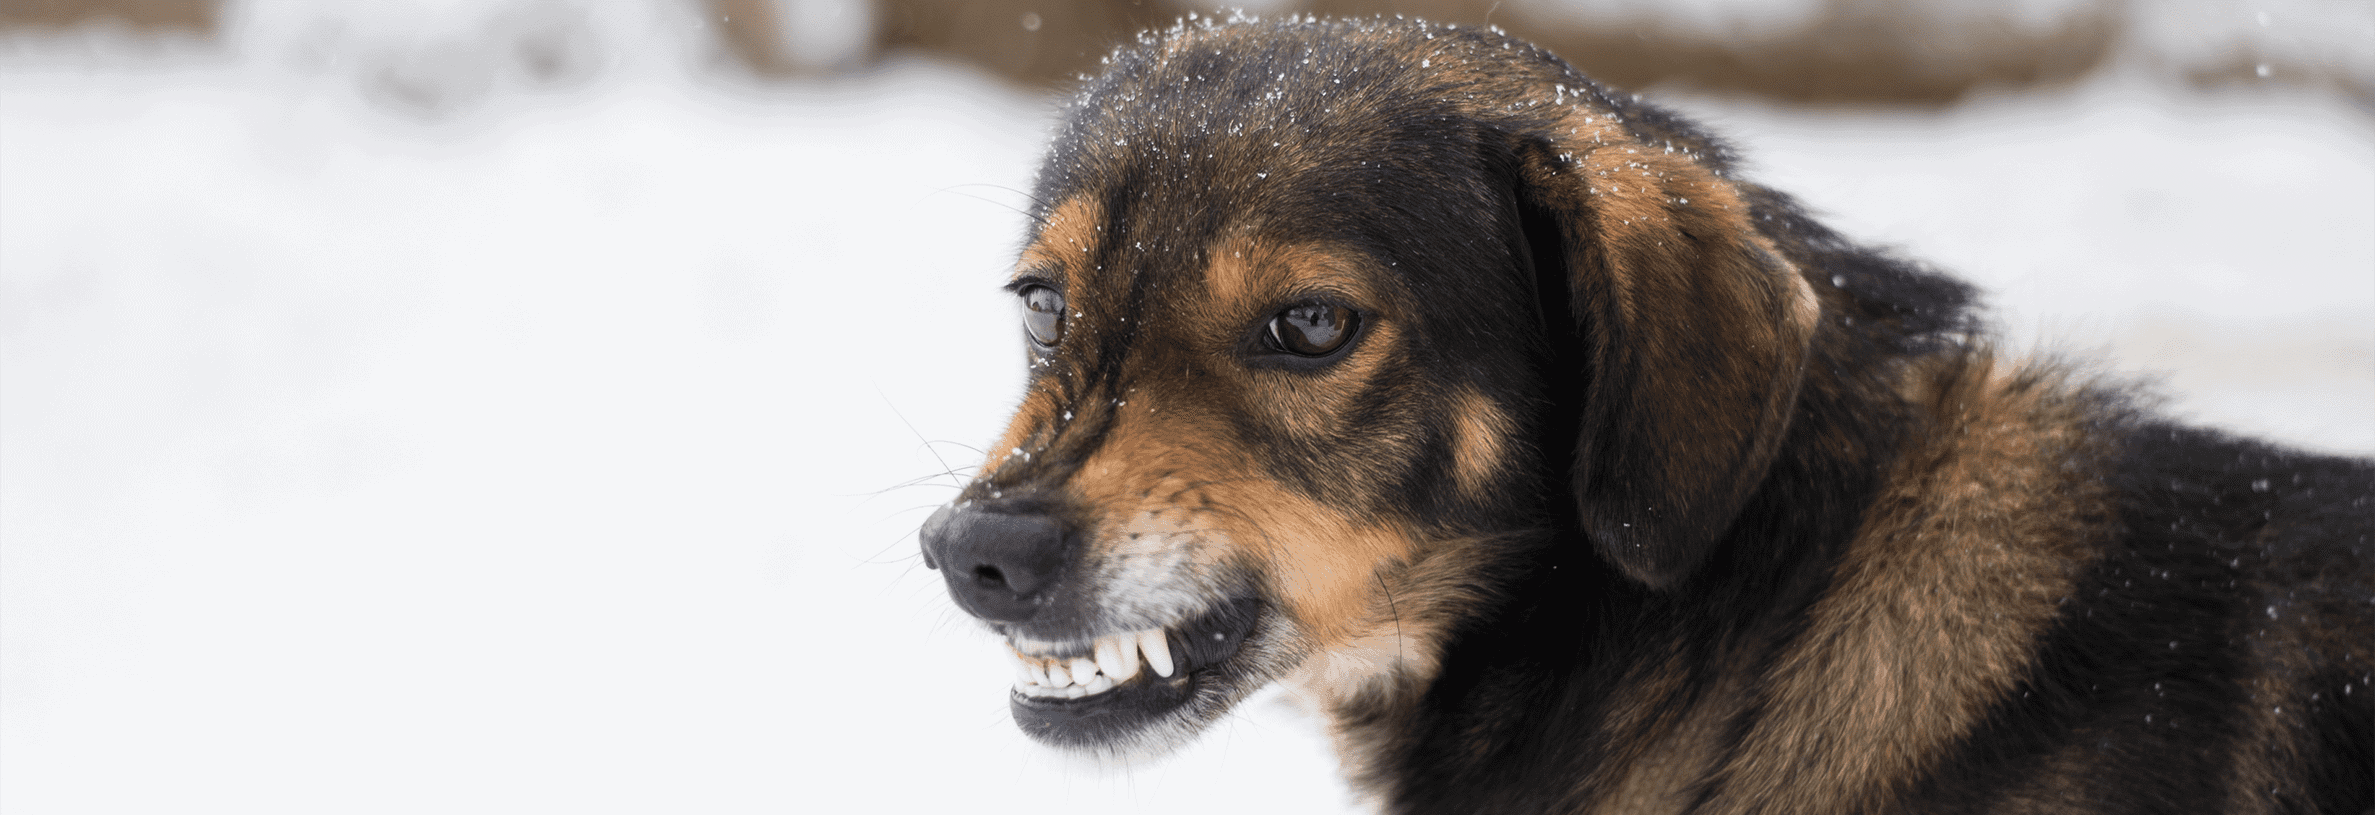 Mijn hond gromt